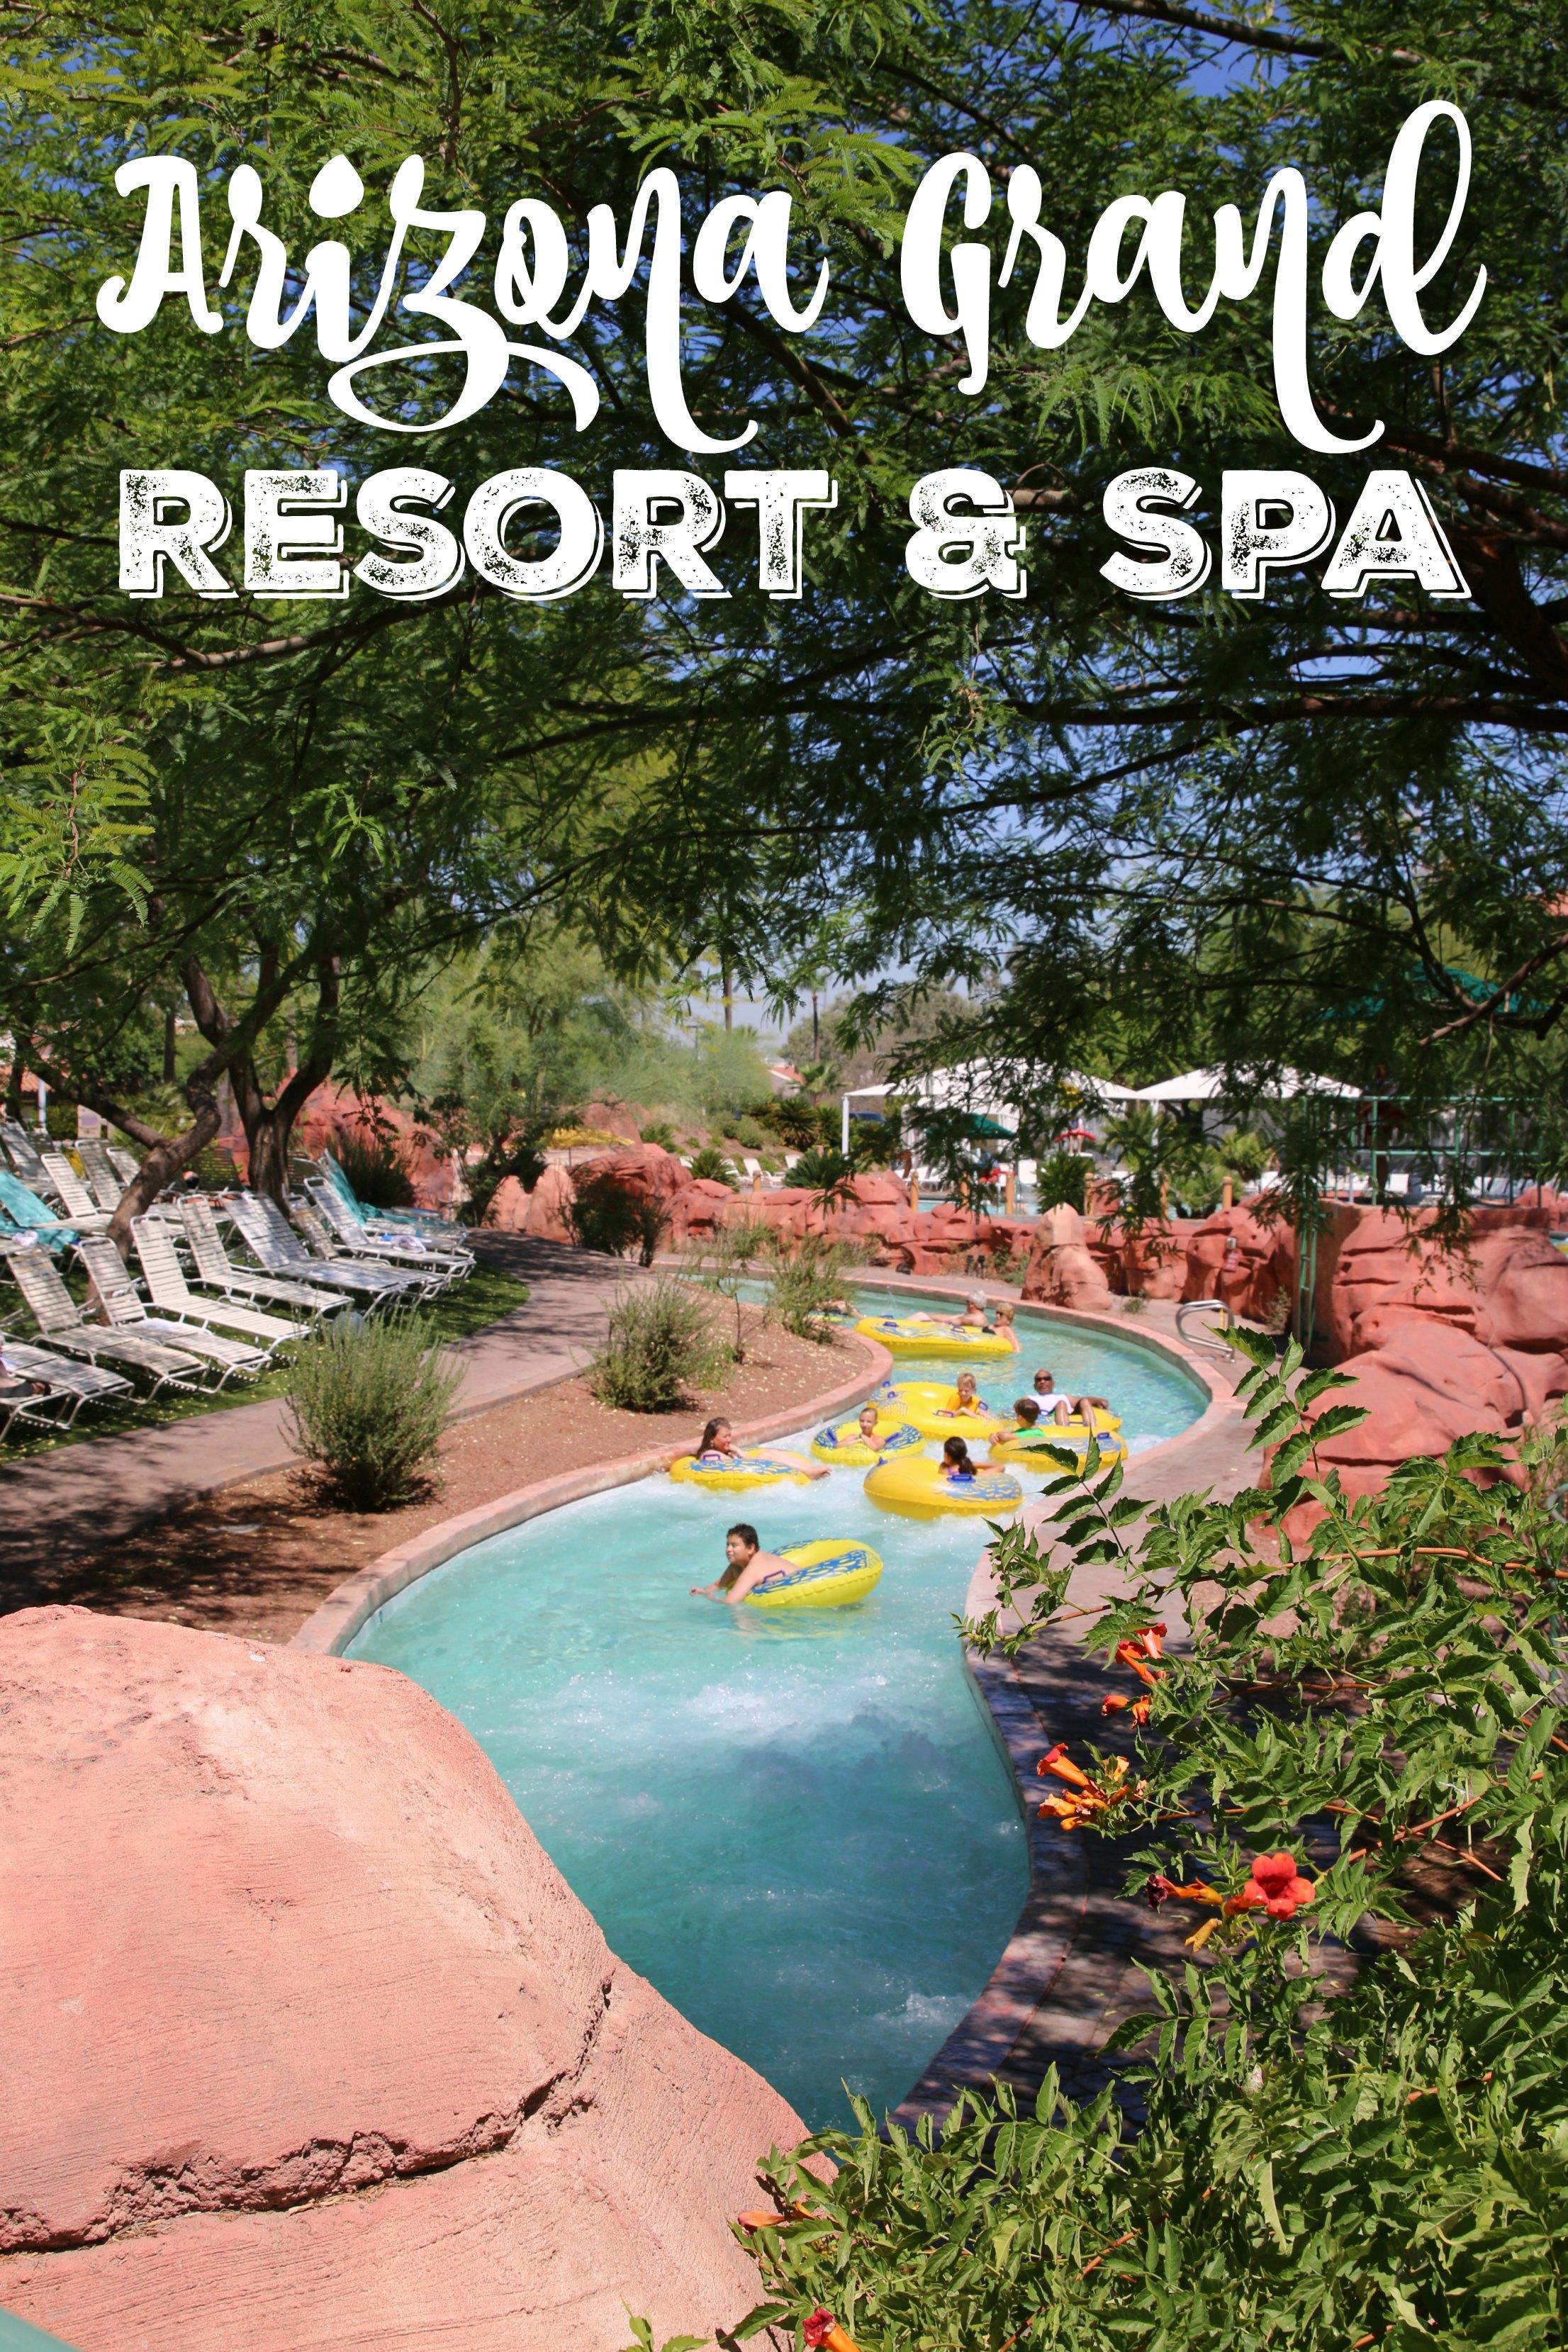 Arizona Grand Resort & Spa Review